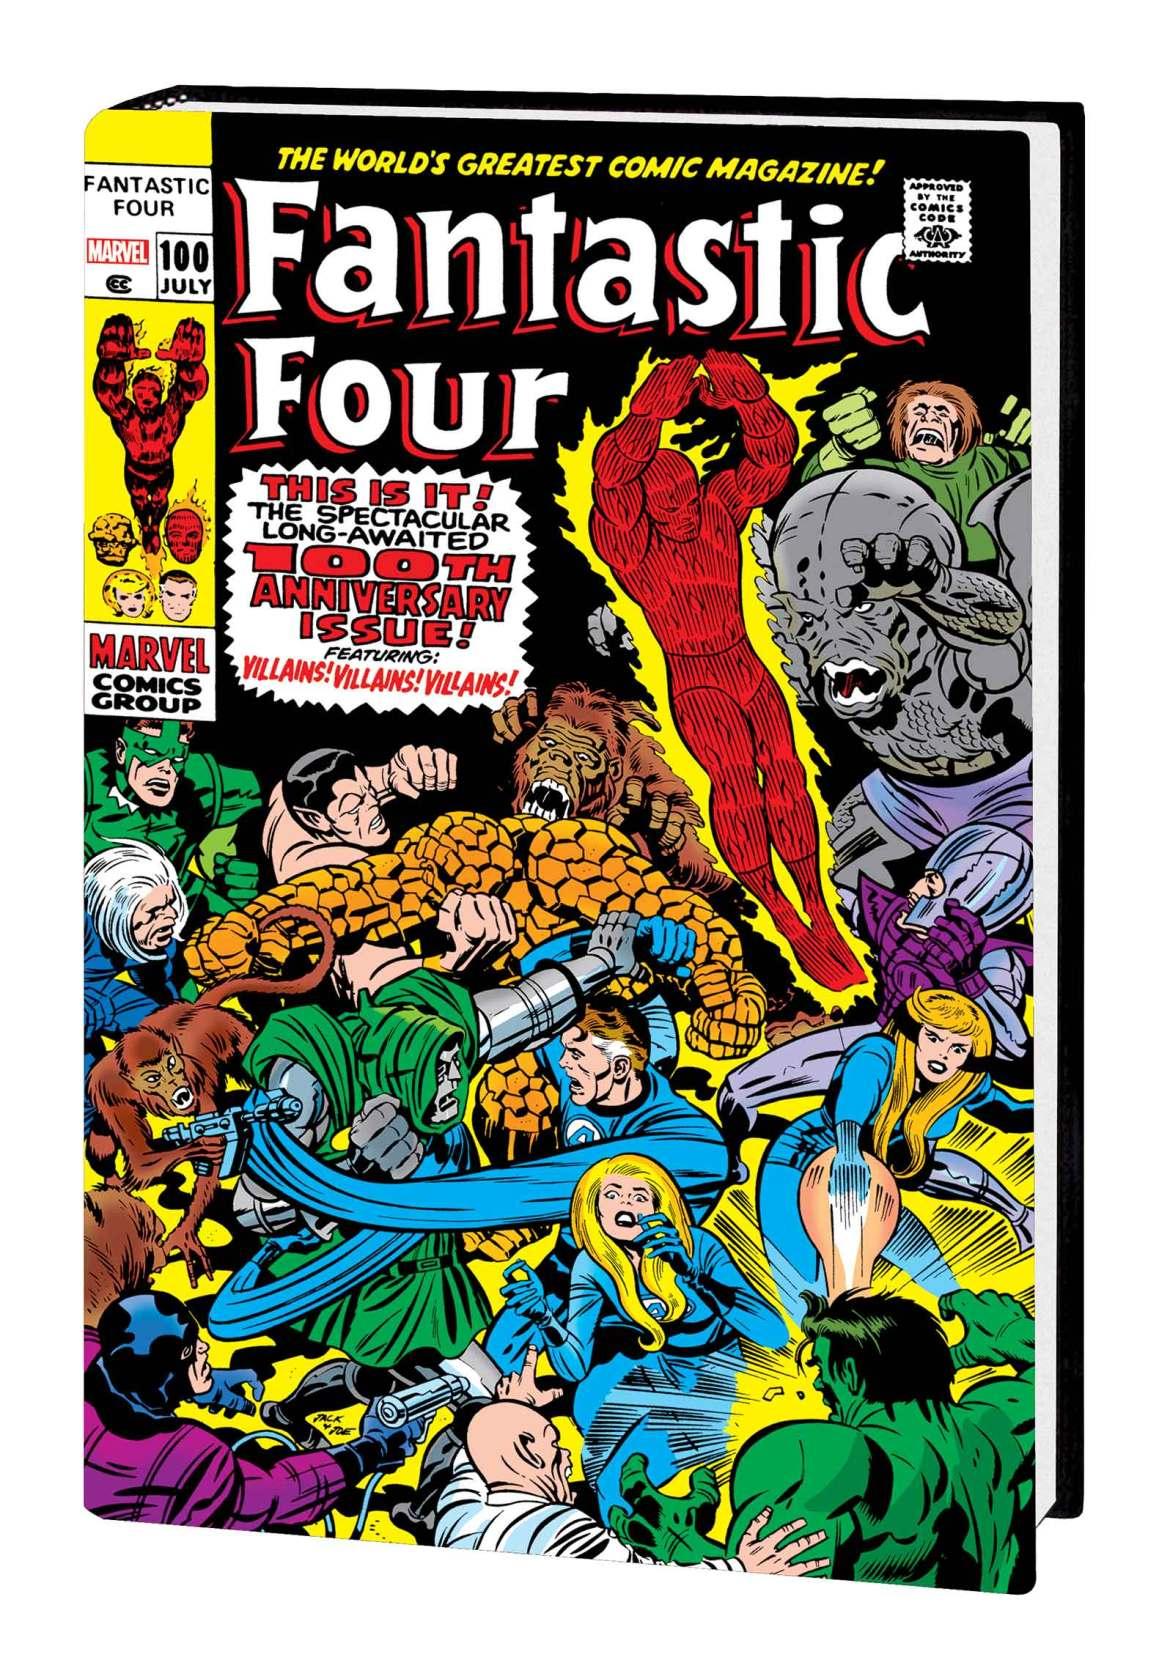 FF_OMNIBUS_V4_HC_KIRBY Marvel Comics May 2021 Solicitations